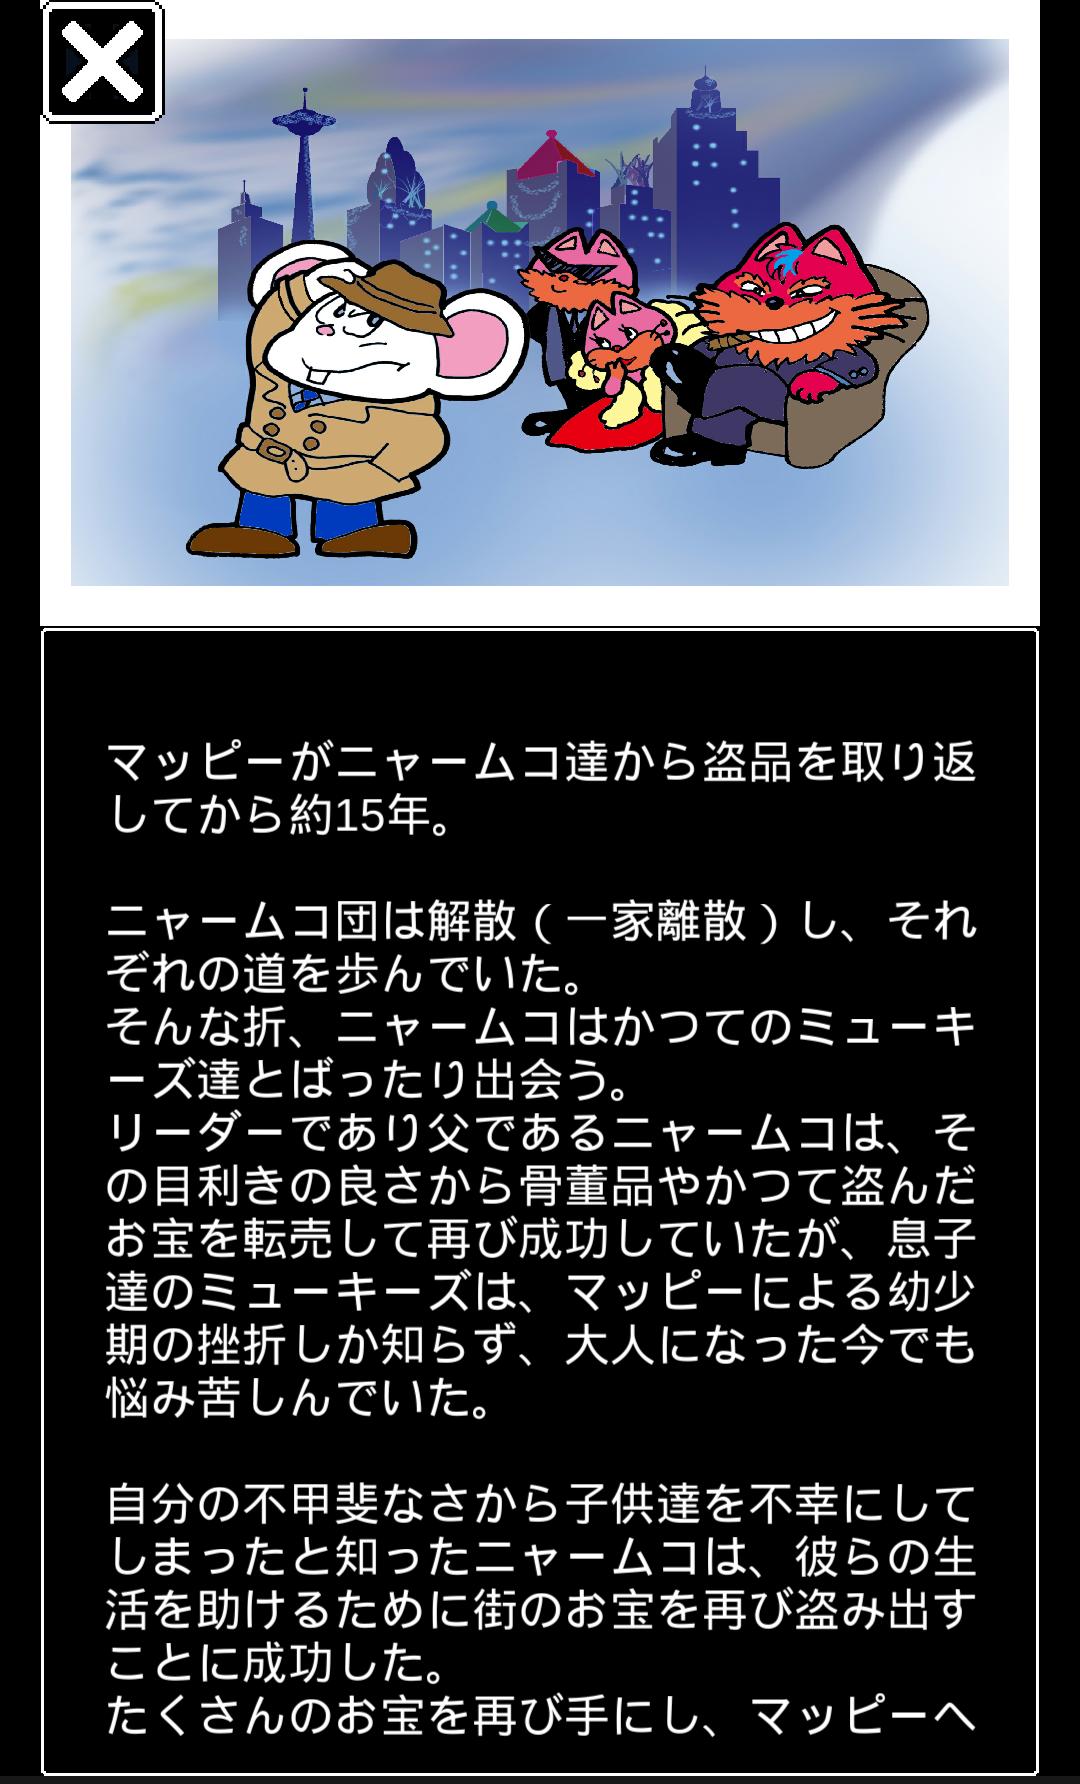 androidアプリ タッチ・ザ・マッピー 復活のニャームコ団攻略スクリーンショット2